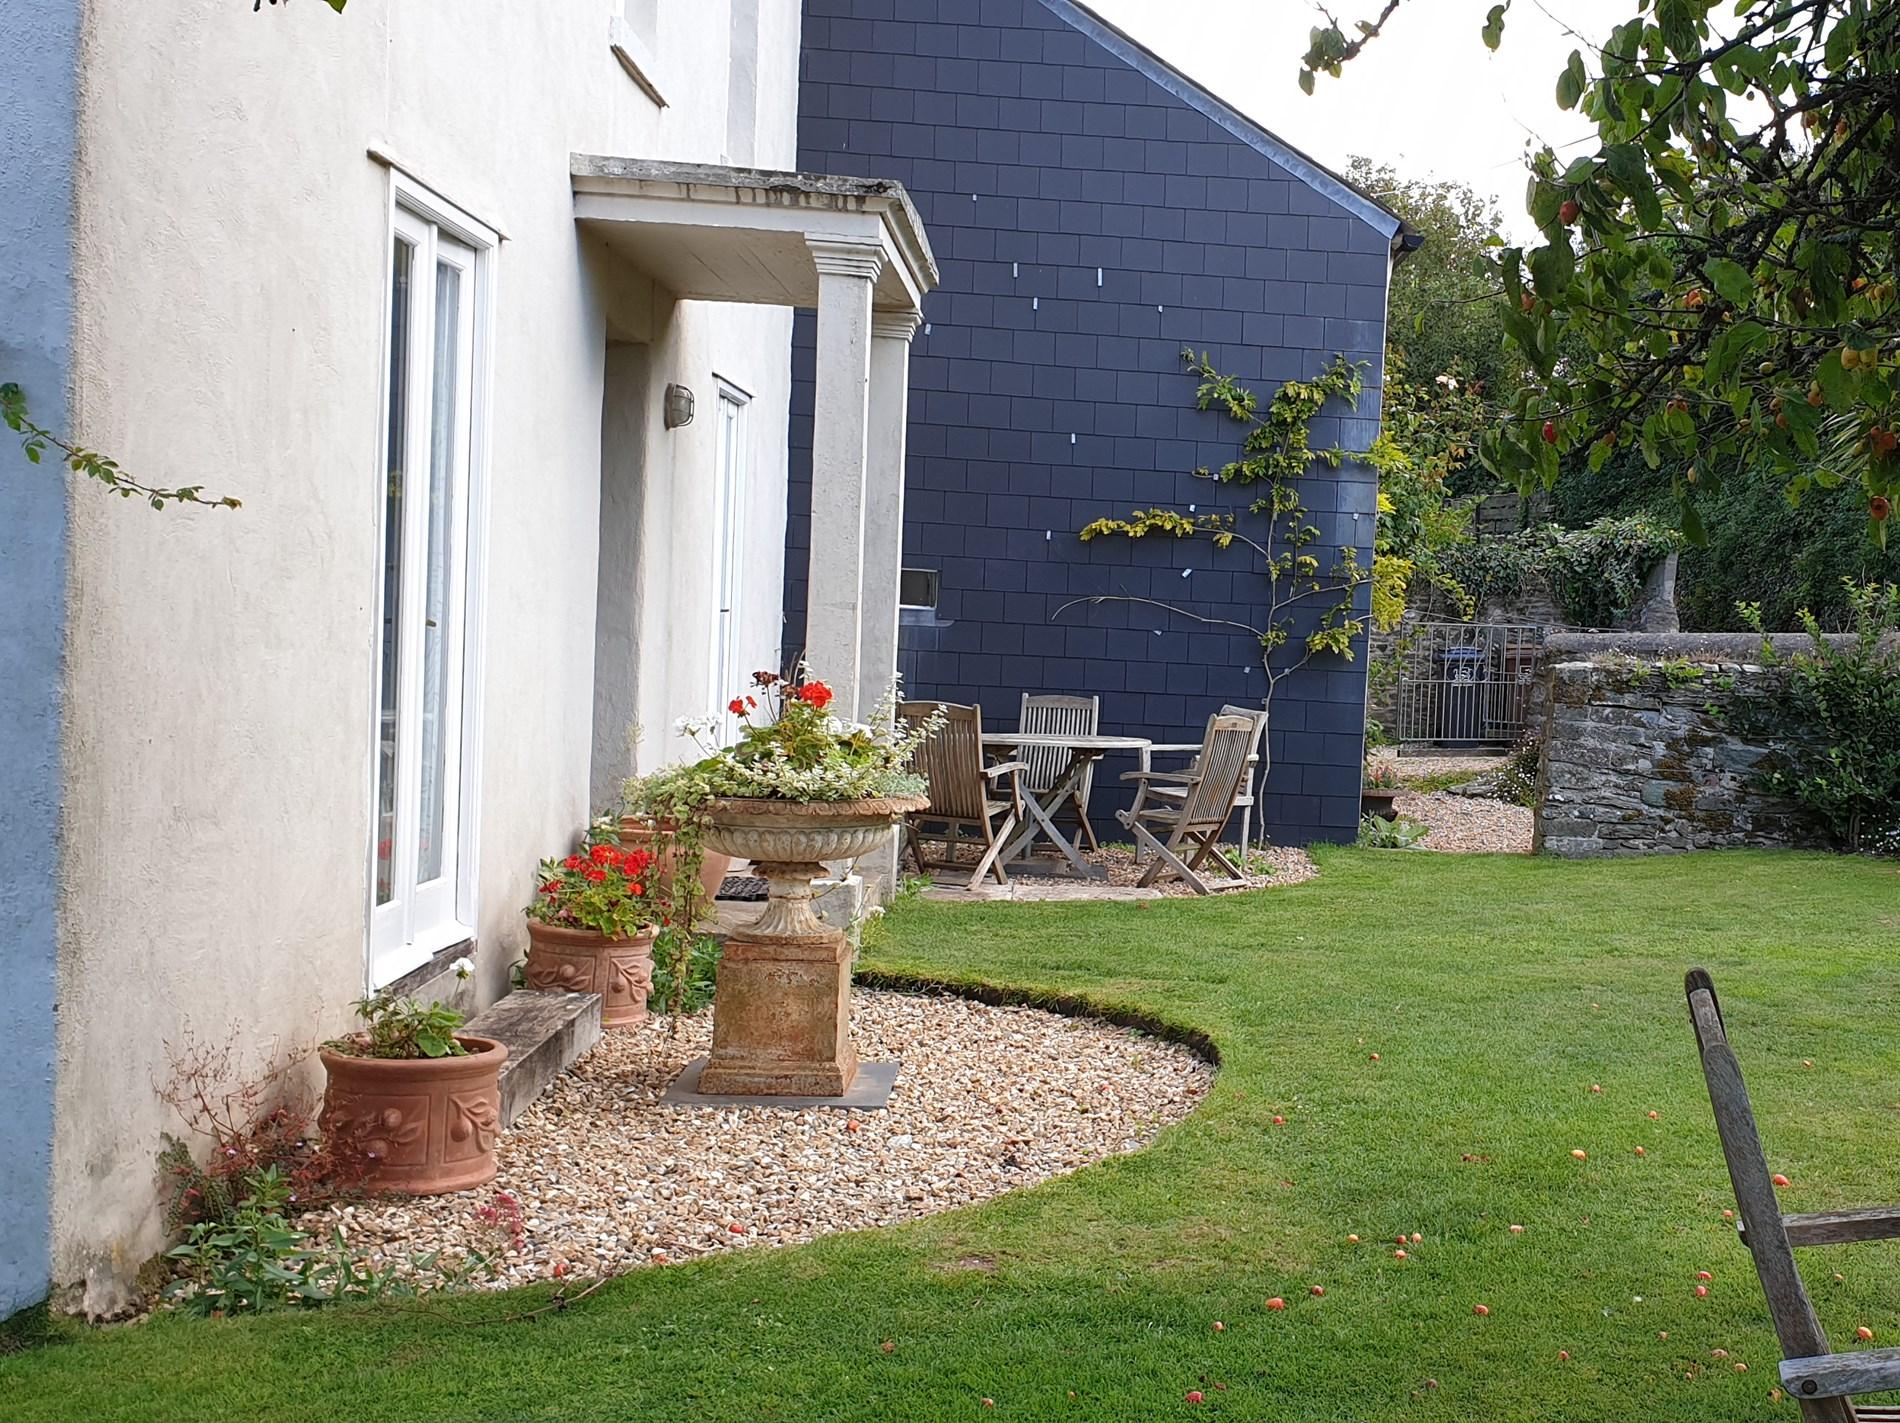 2 Bedroom Apartment in South Devon, Devon